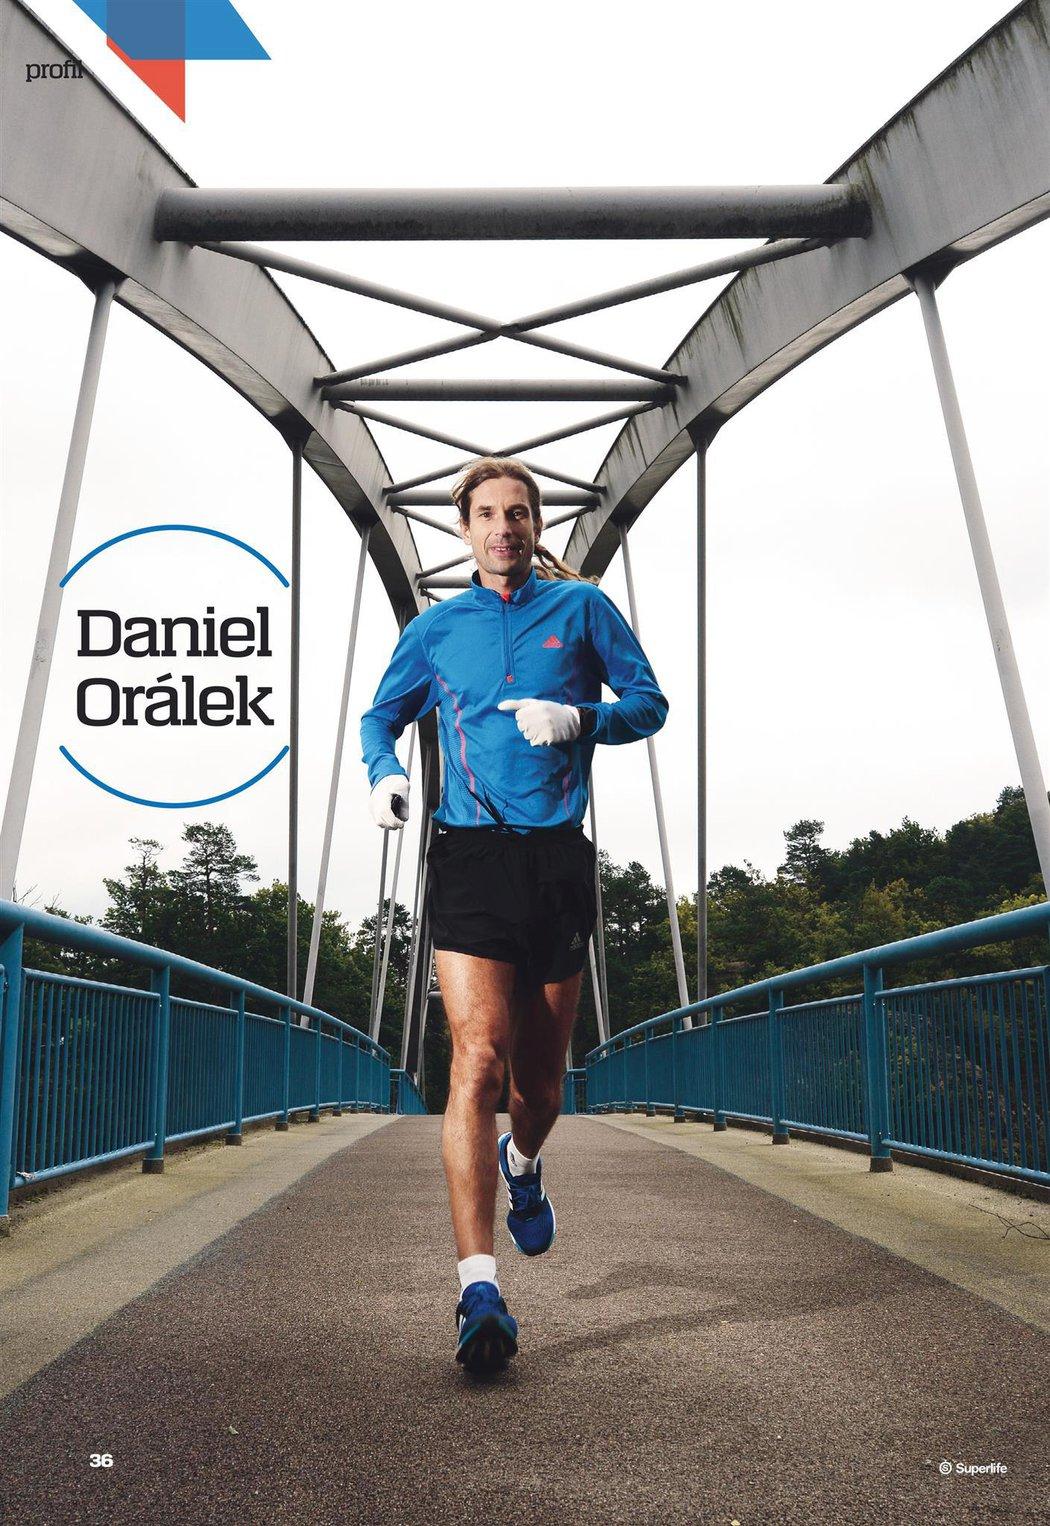 Daniel Orálek